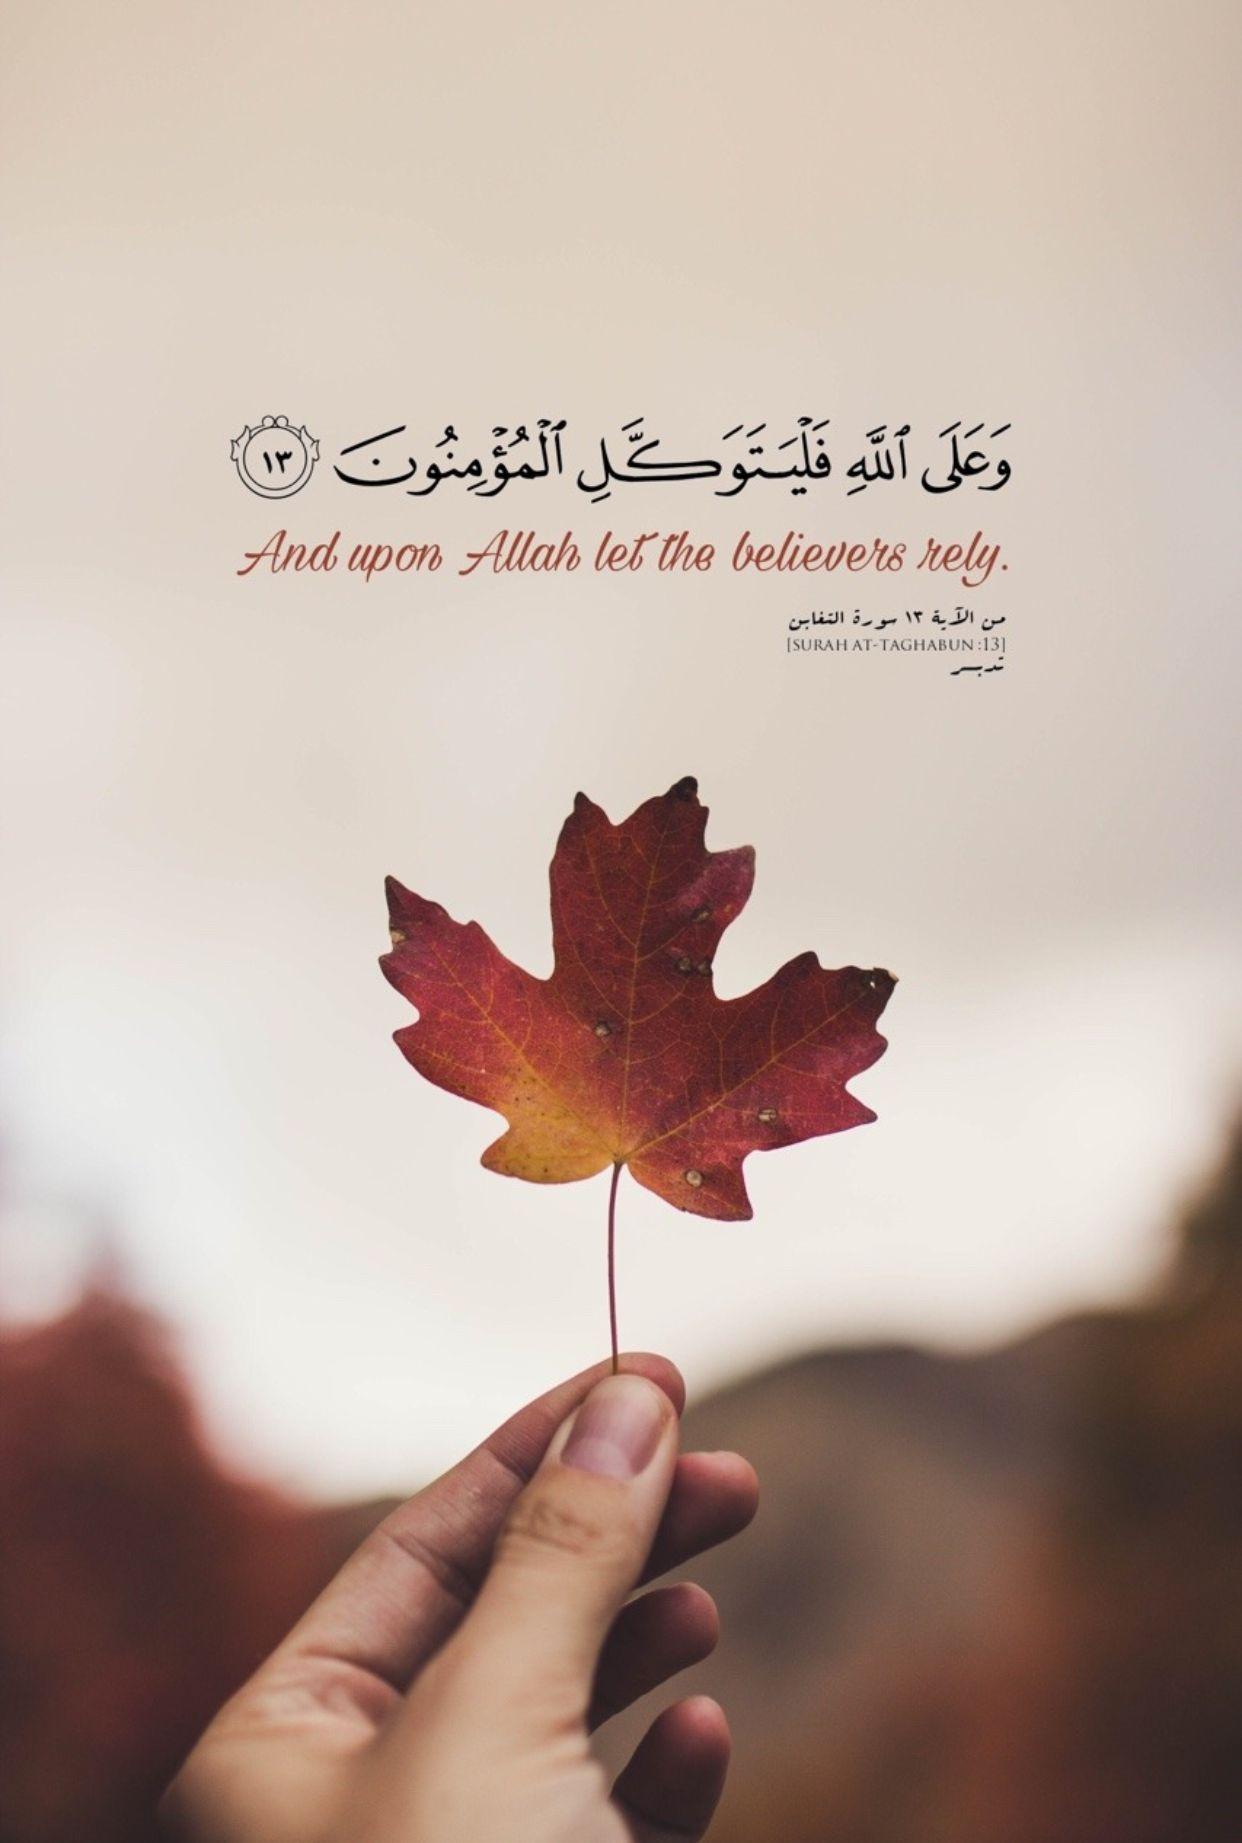 Pin By Fahad Baloch On Quran Verses Islamic Quotes Quran